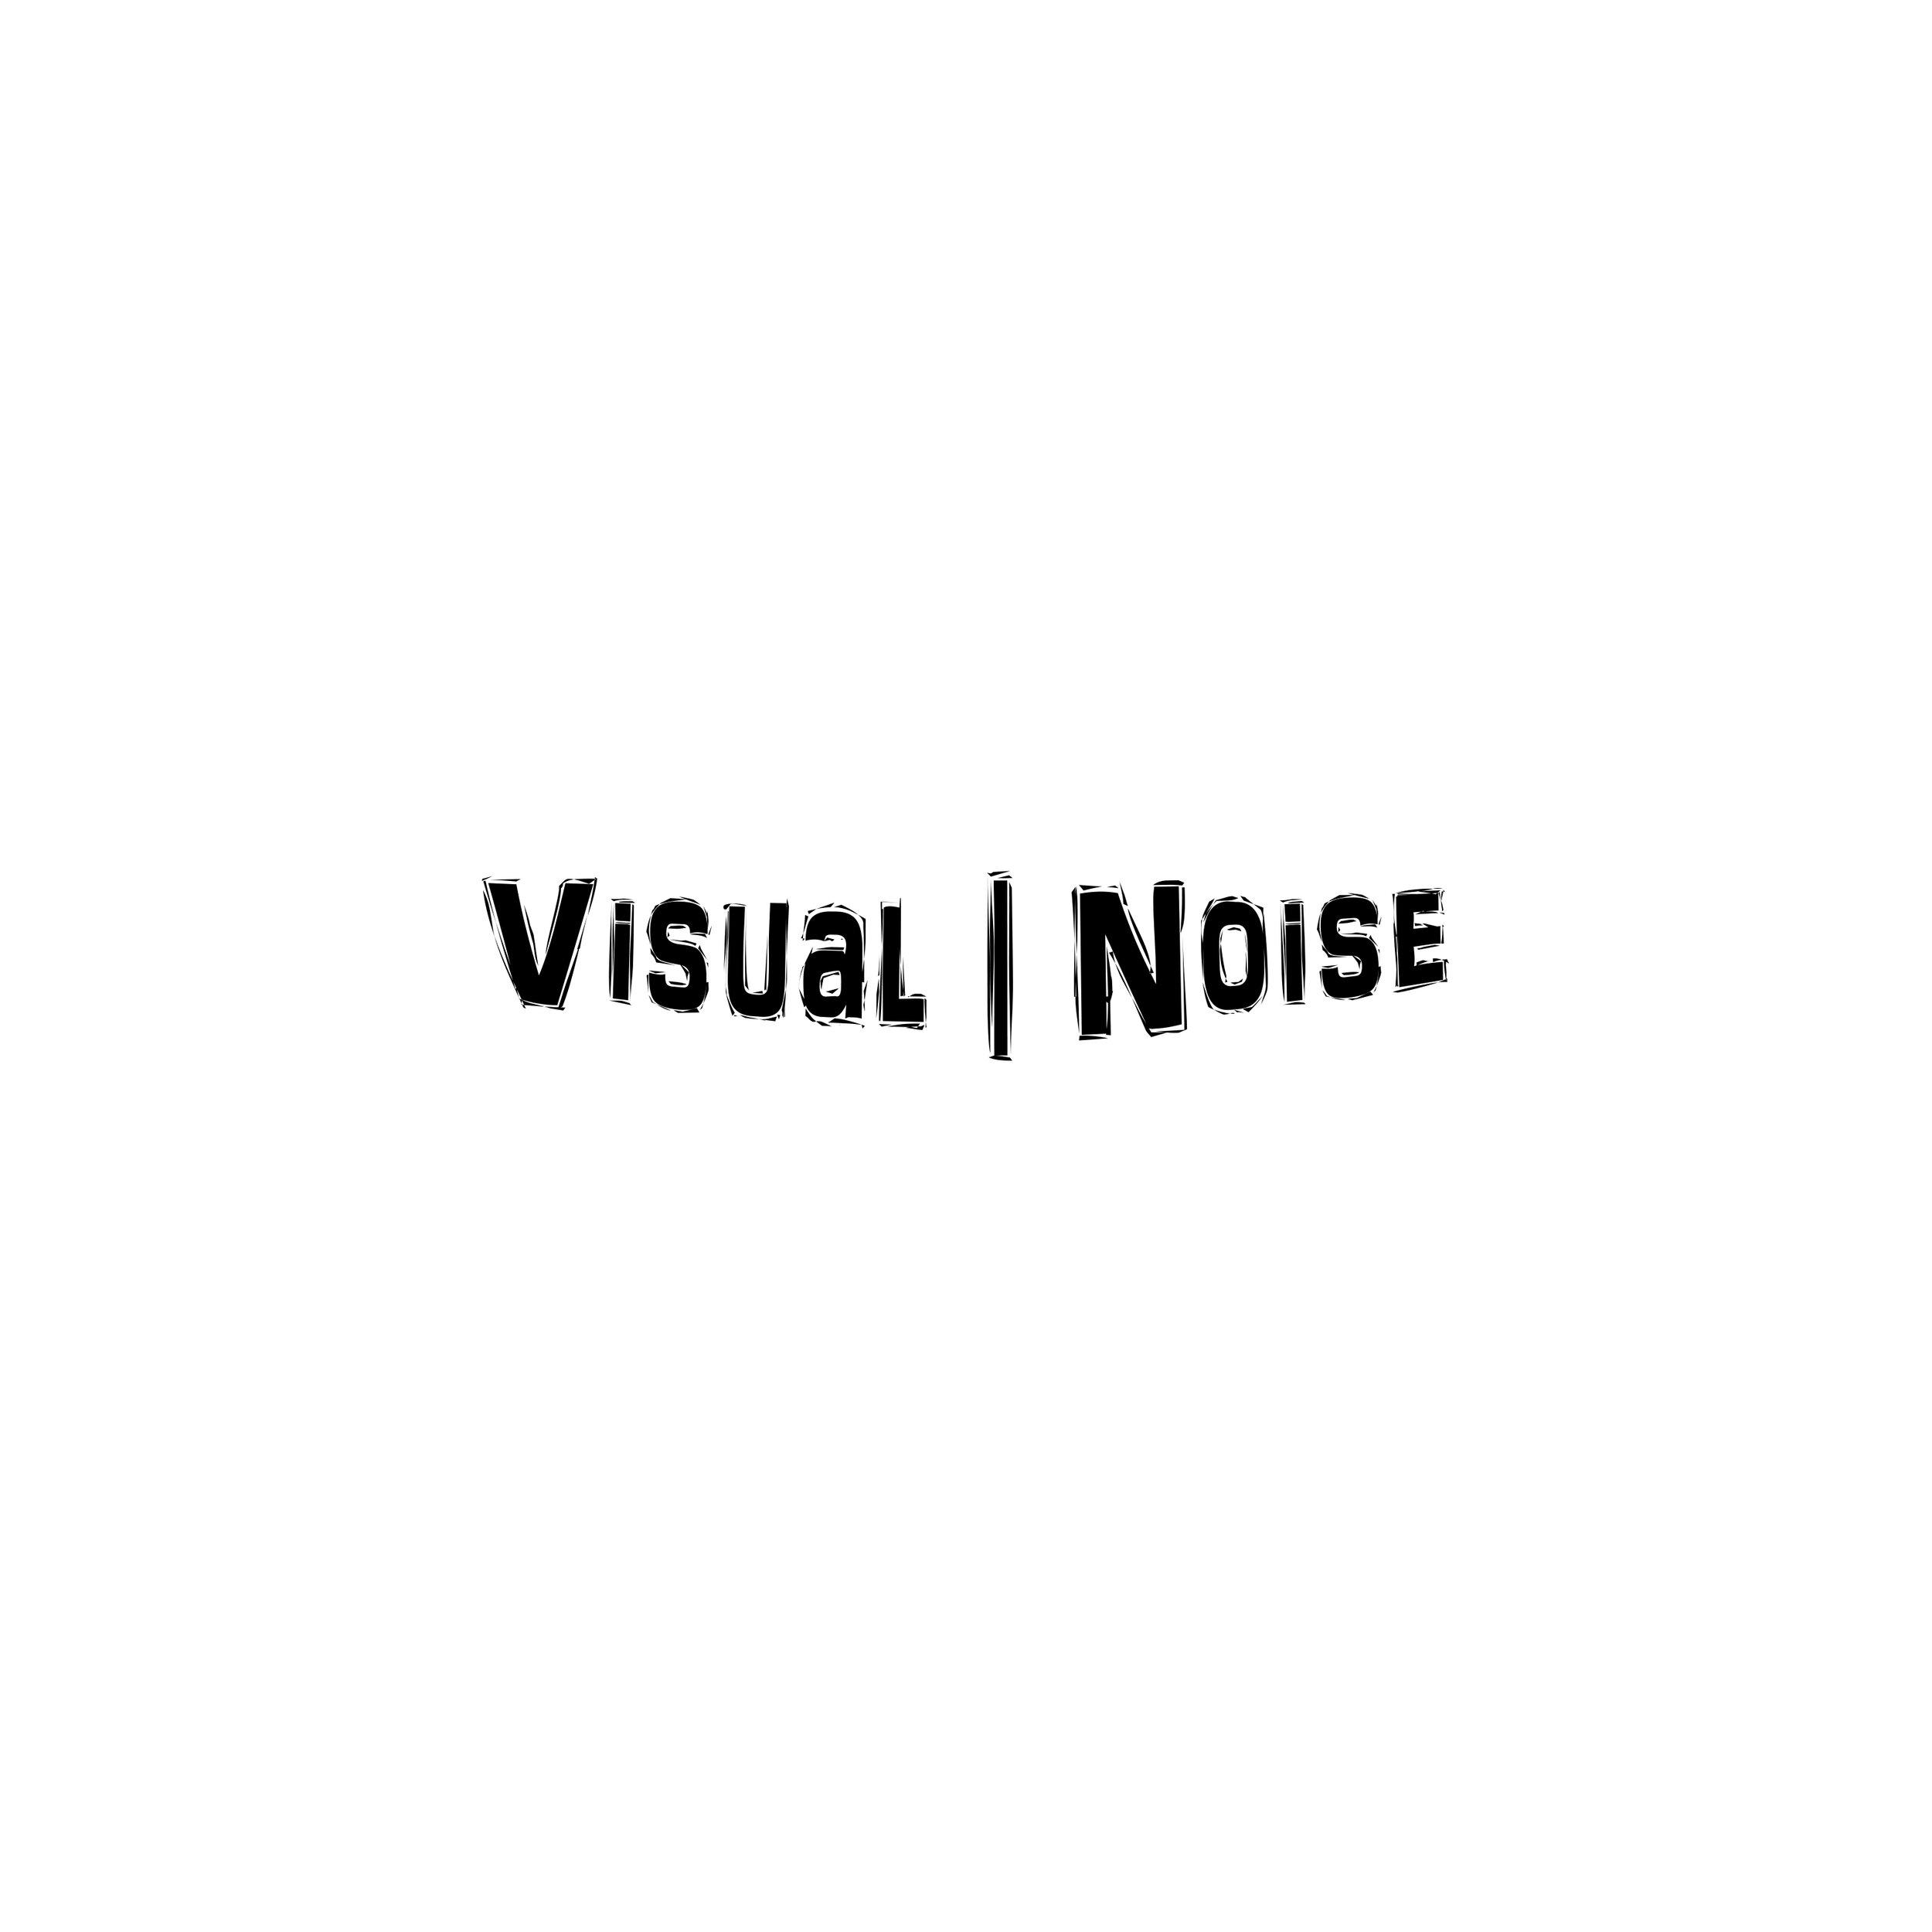 VisualNoise Insta Twiter.jpg